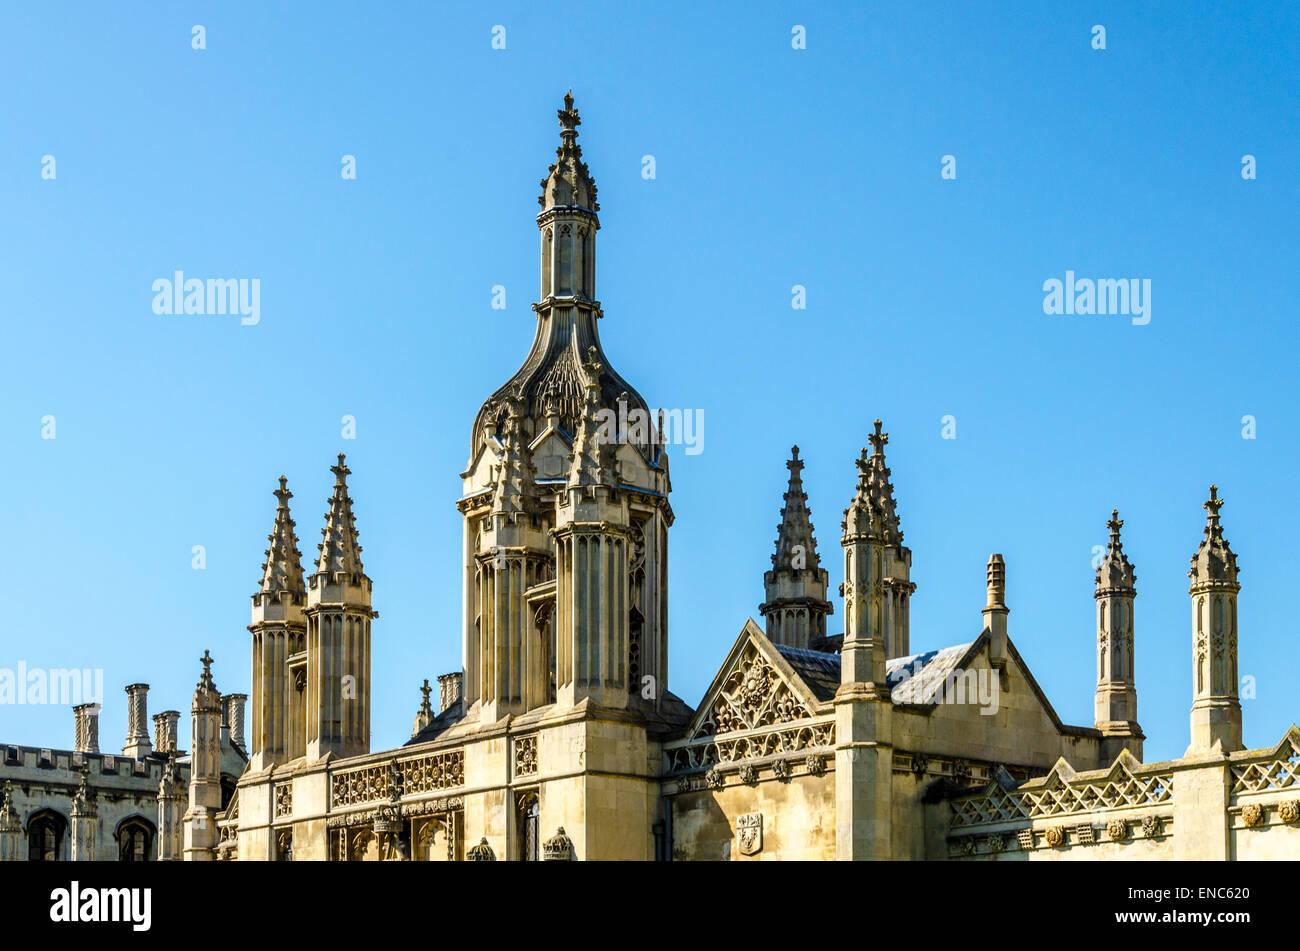 King's College, Cambridge - Stock Image